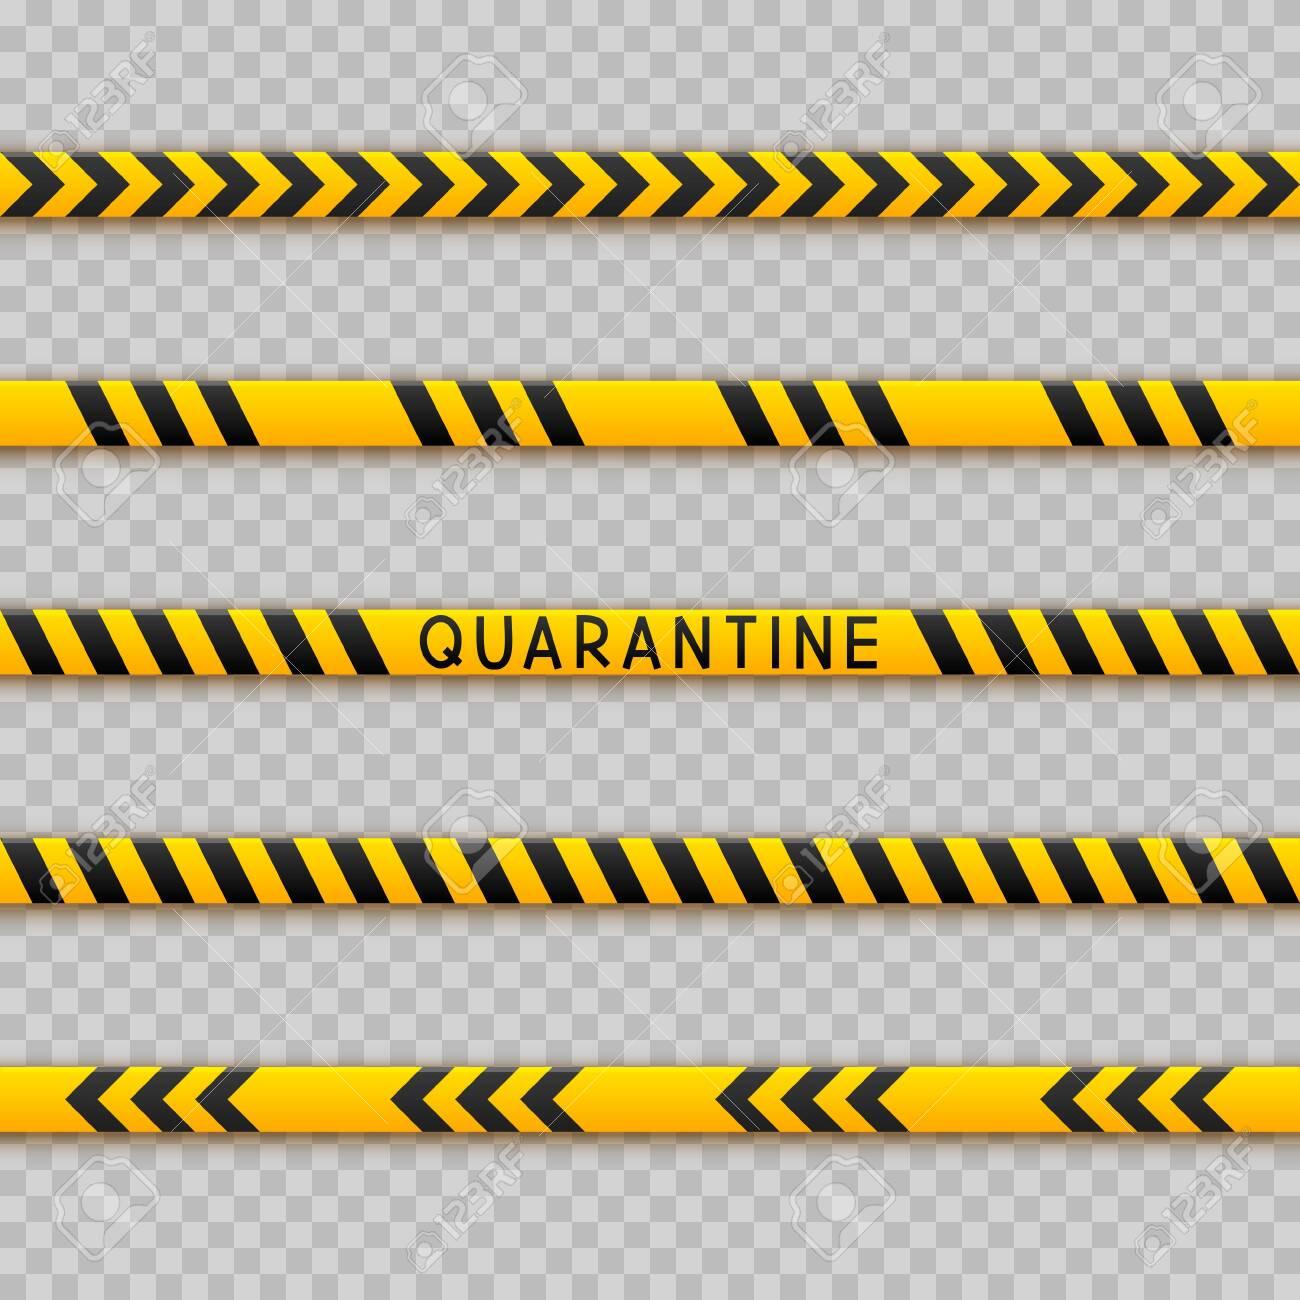 Set of seamless signal tape borders for quarantine coronavirus design on transparent background - 147408018